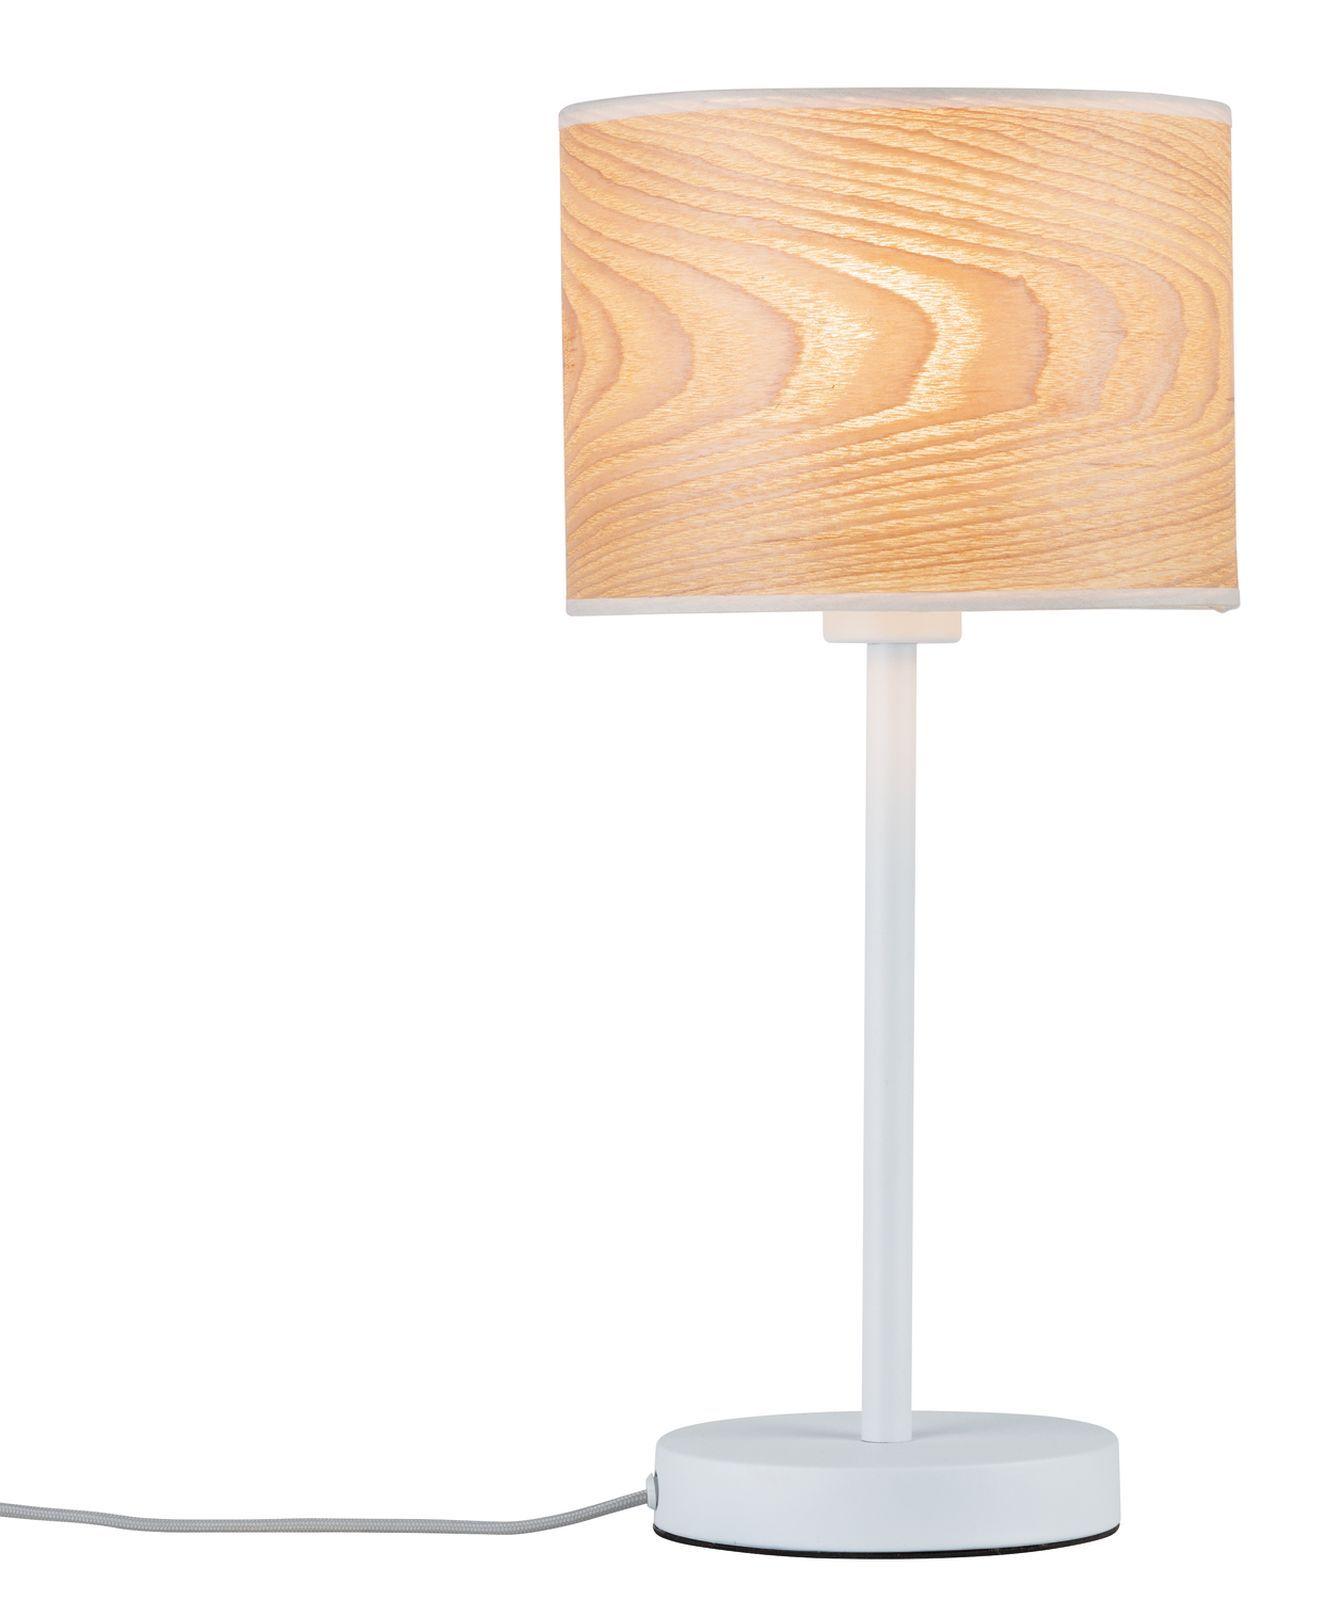 Paulmann Tischleuchte Neordic Neta 1 Flammig Weiß Holz Skandinavische Lampenlampen